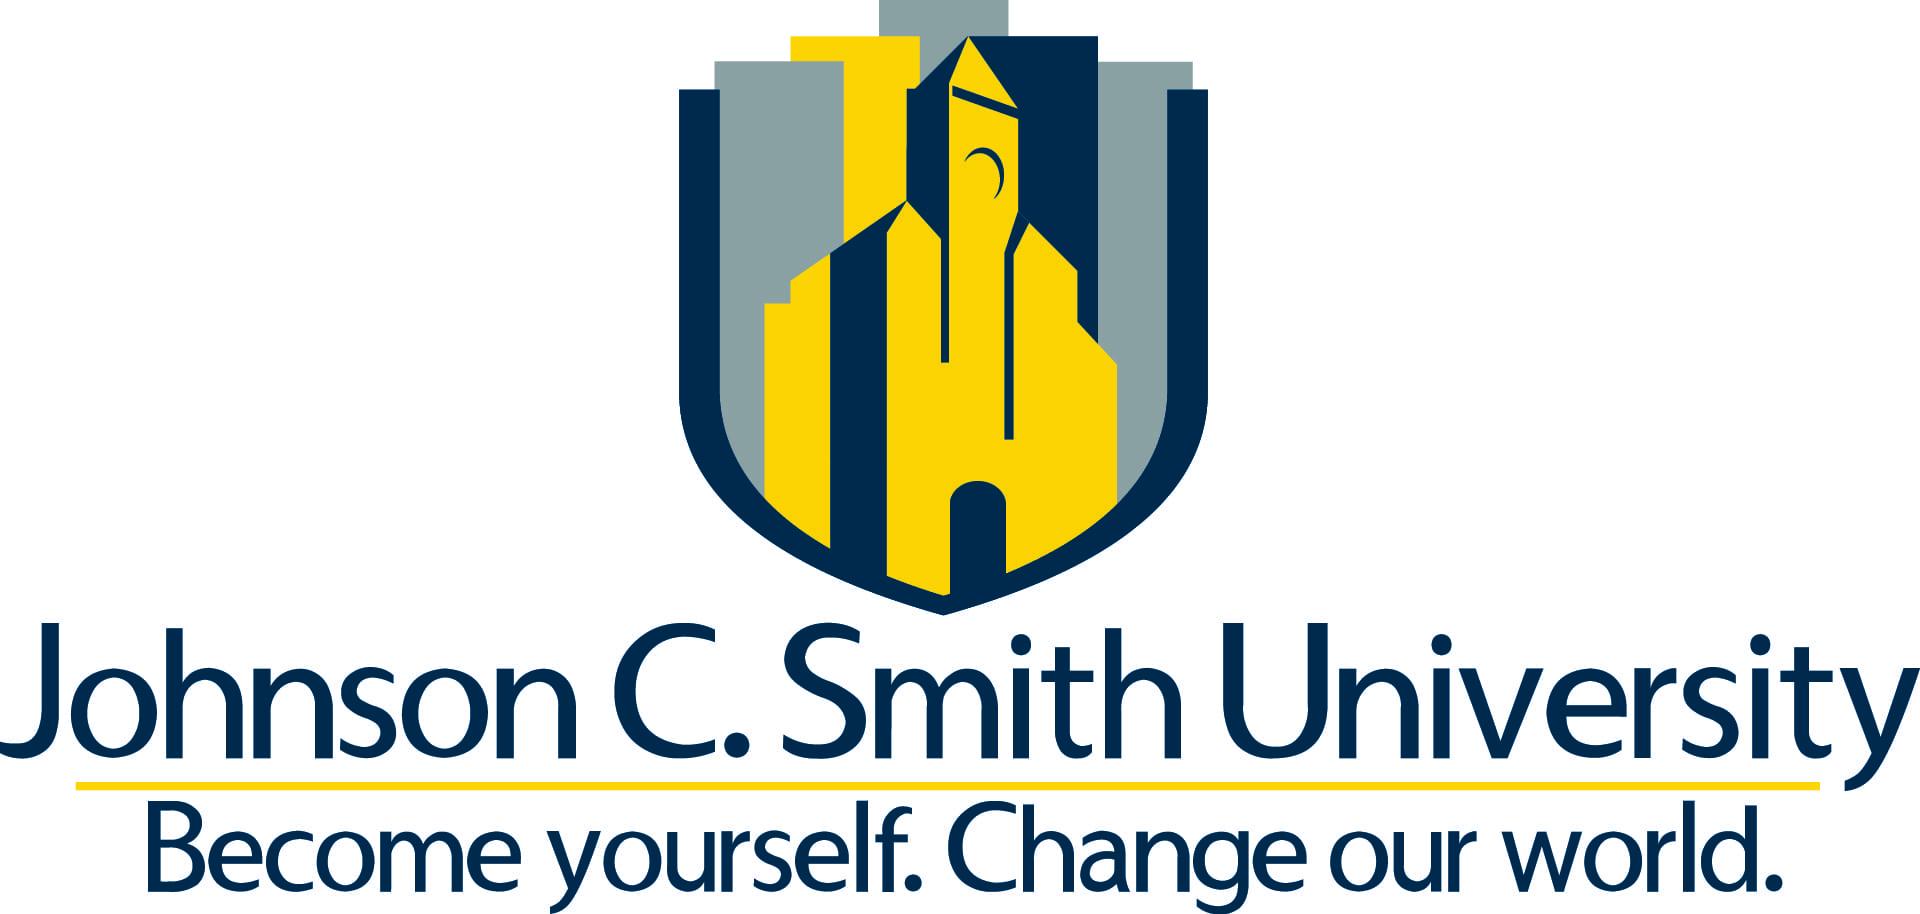 Johnson C. Smith University Logo